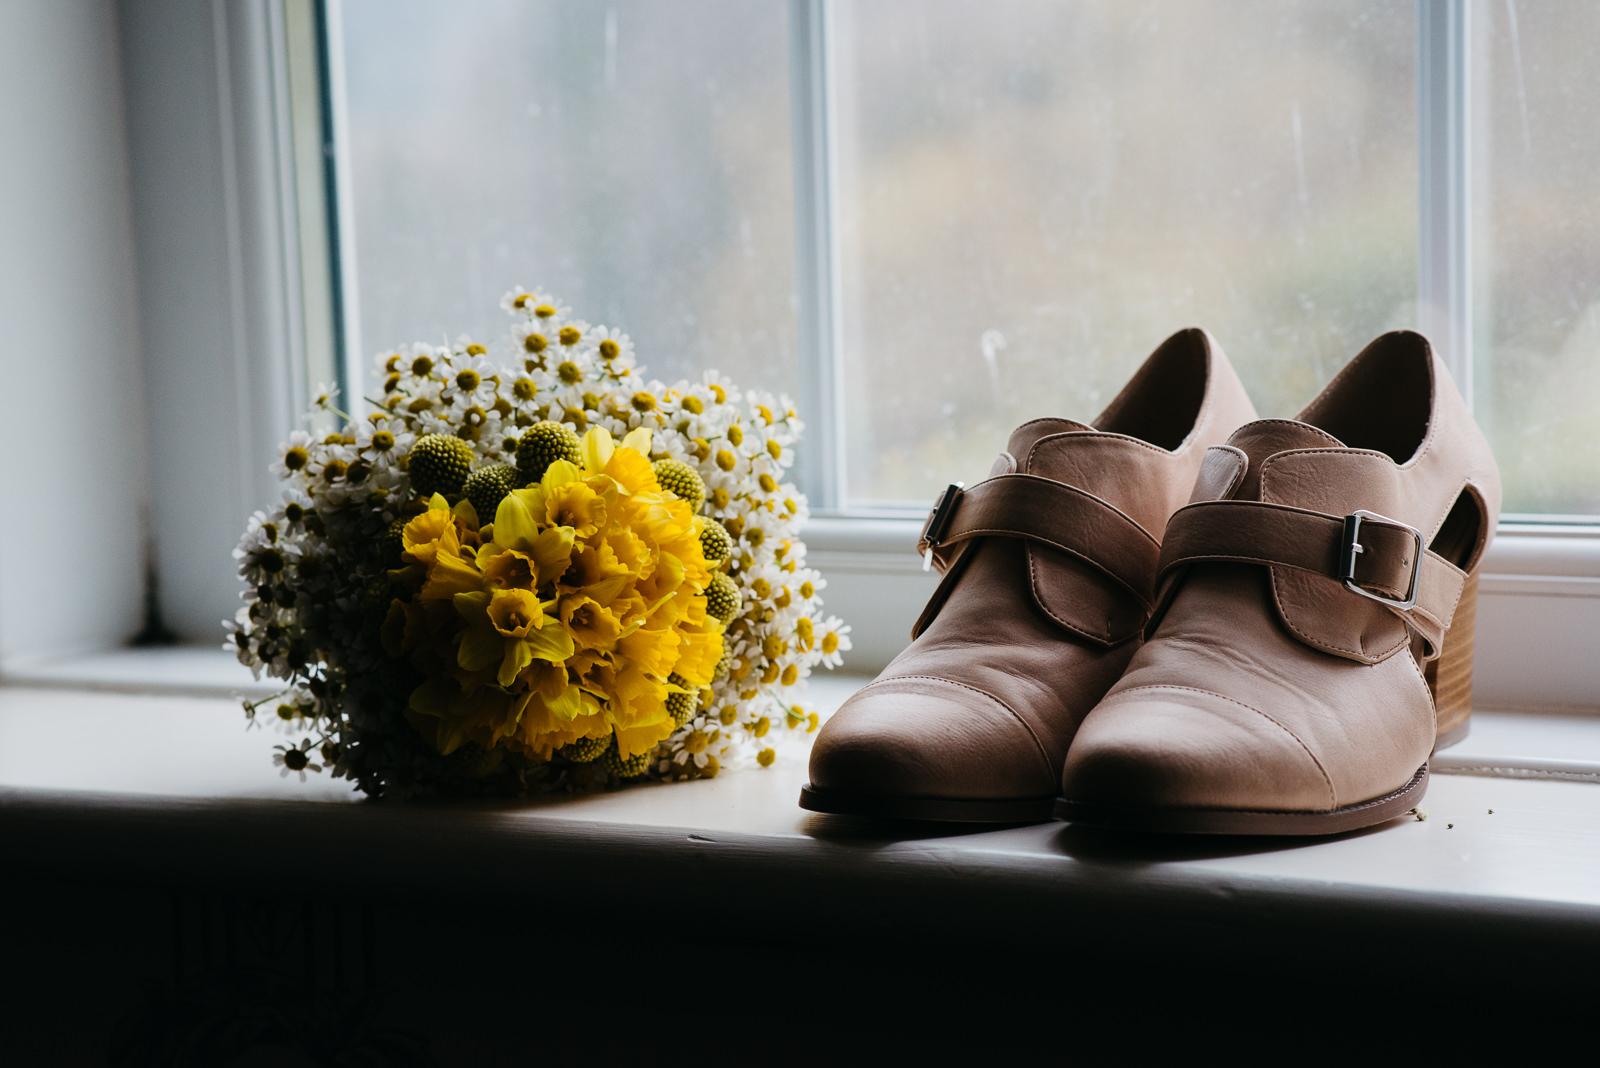 Best Creative Wedding Photography of 2016 by Bath based wedding photographer Elaine Williams.